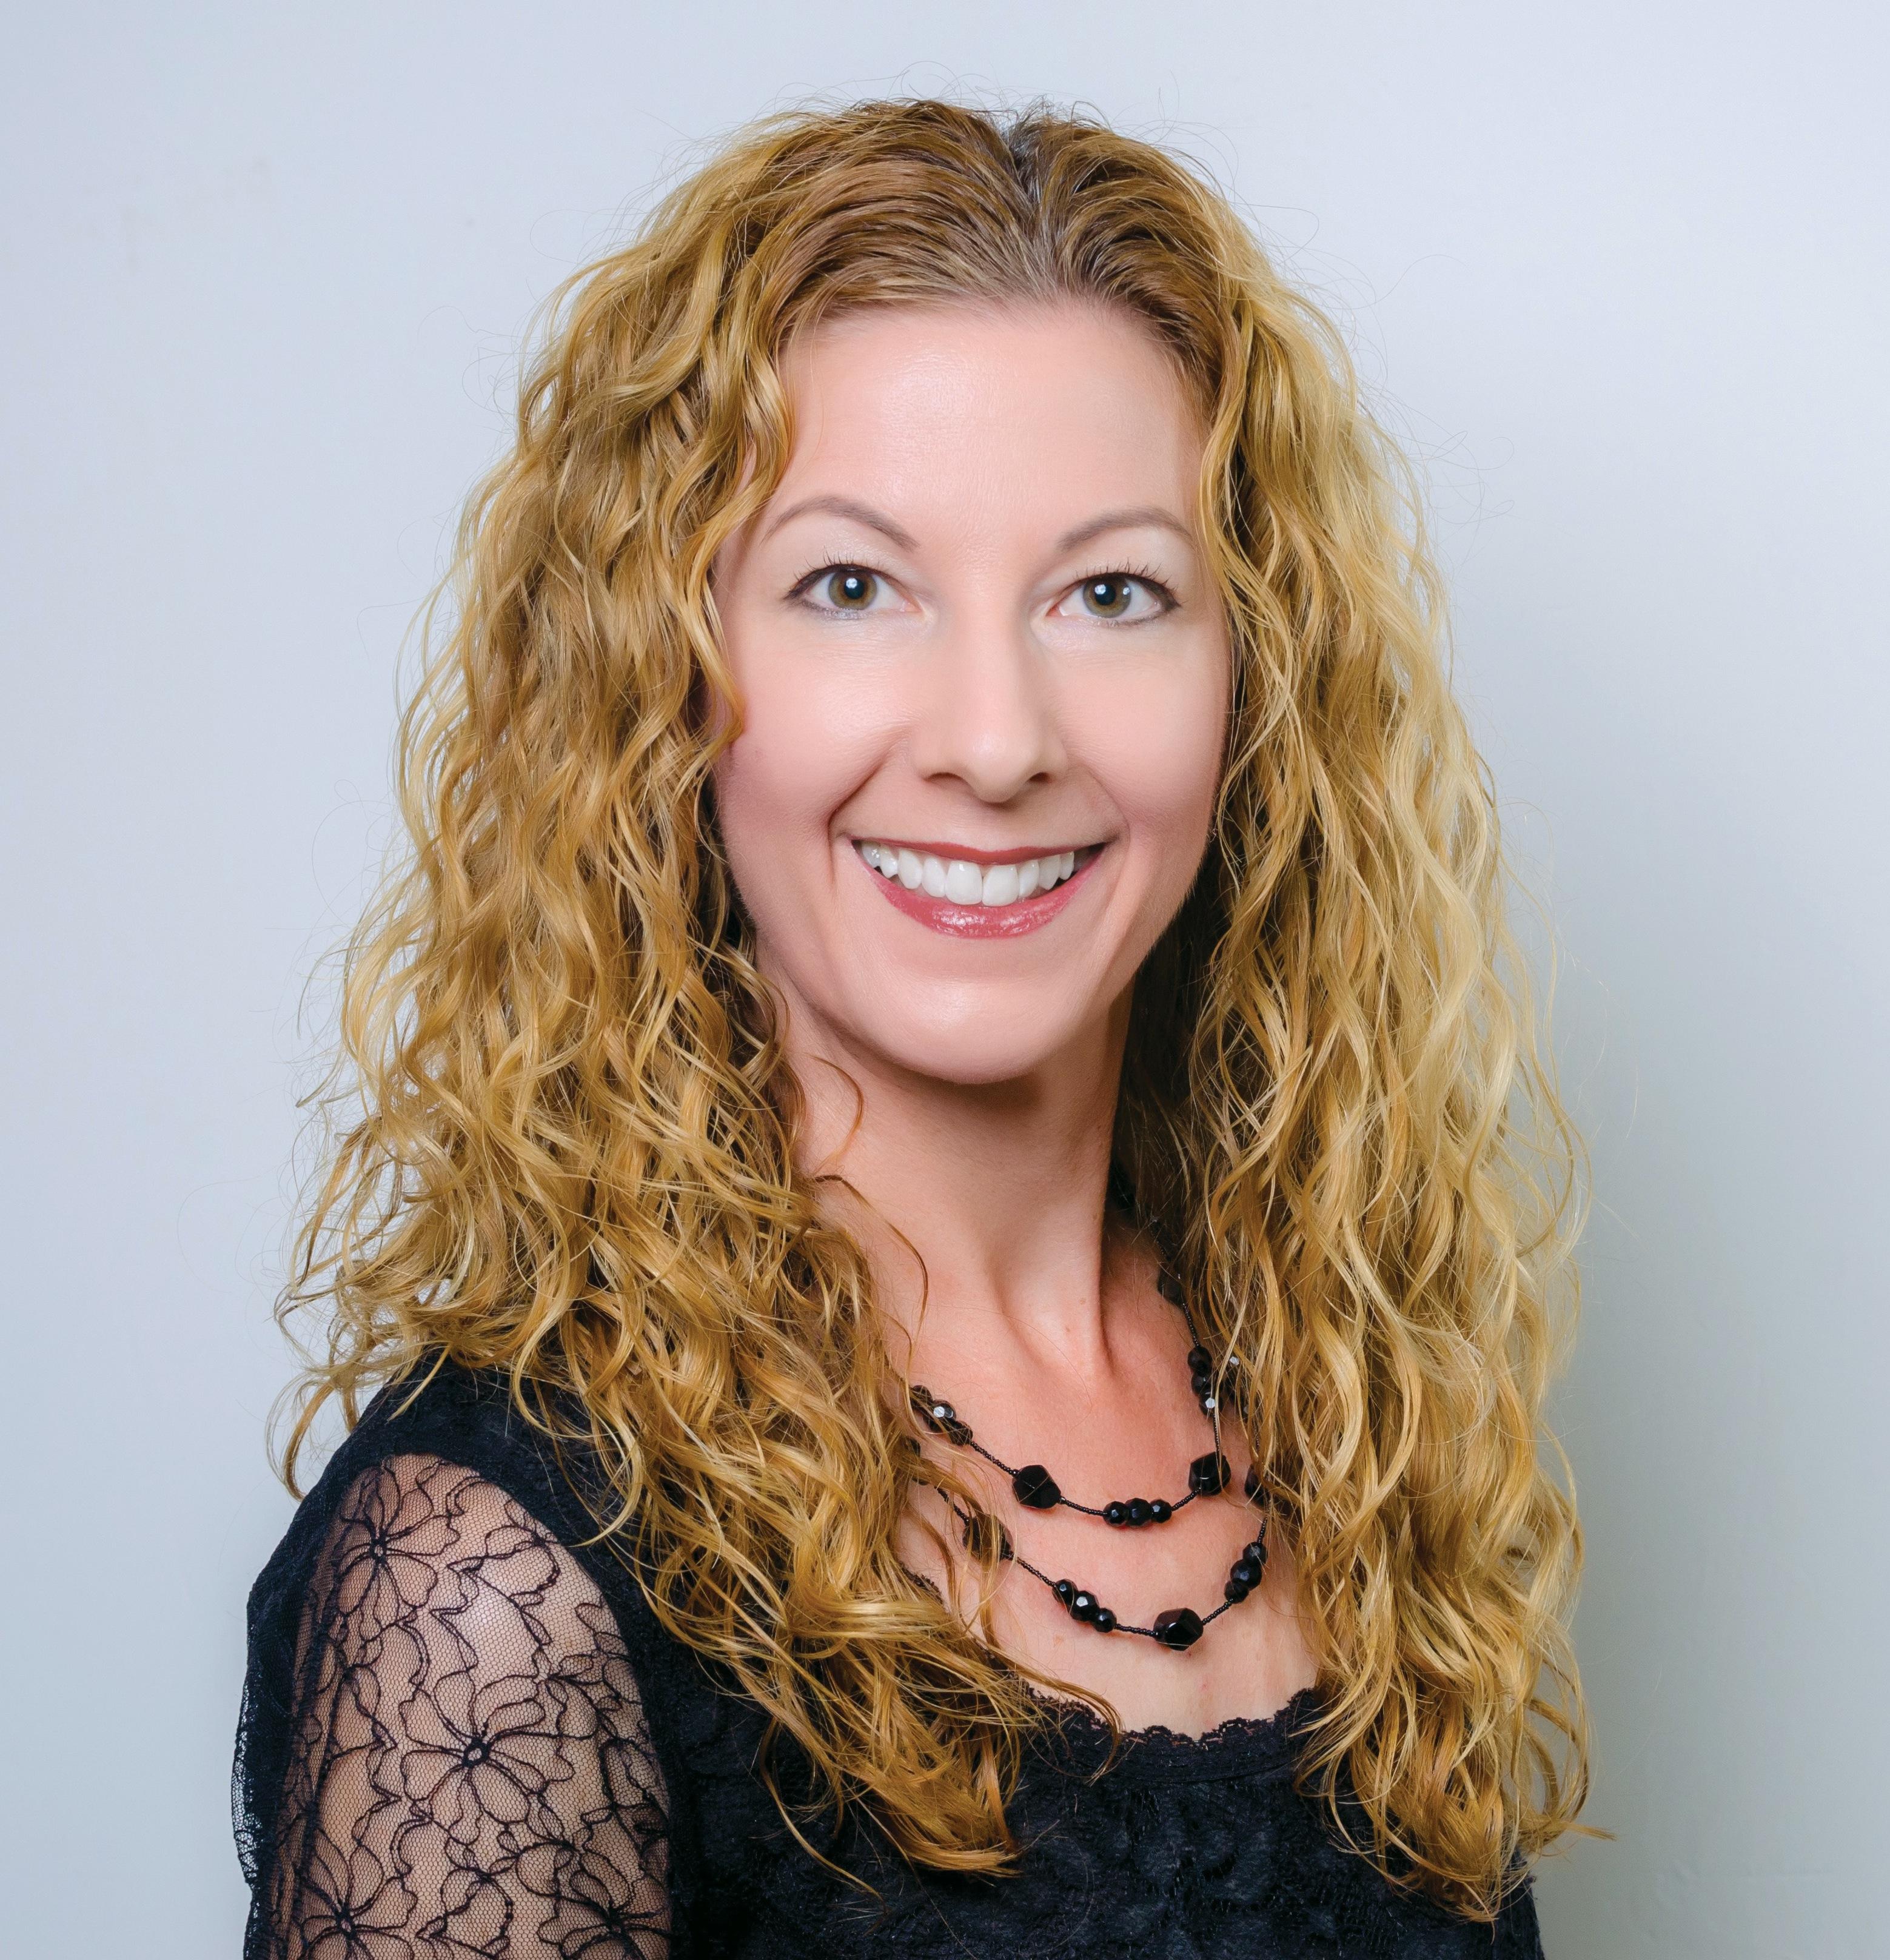 Raw Hair Organics Launches Raw Curls